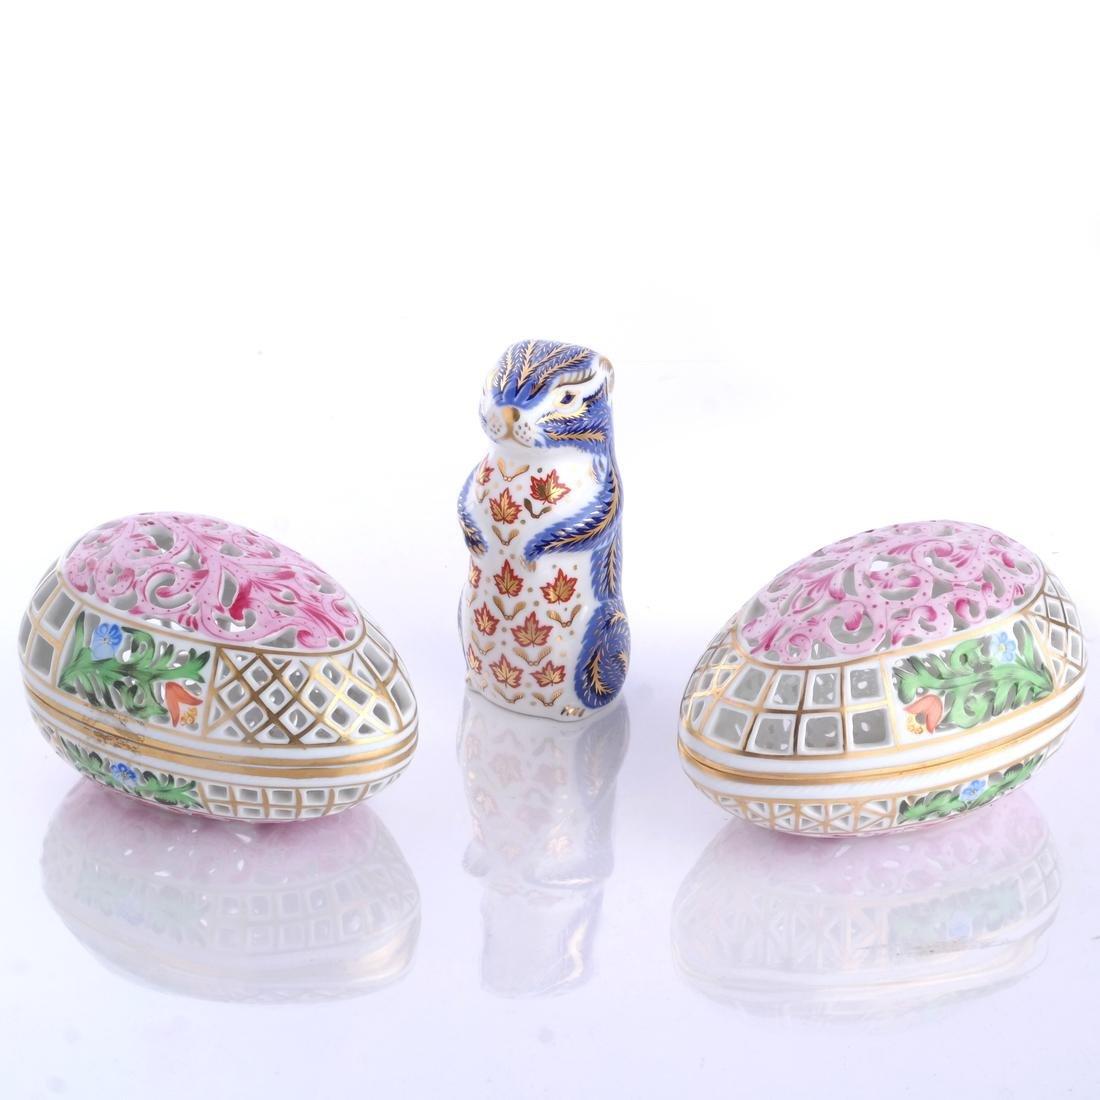 Herend Porcelain Decorative Articles